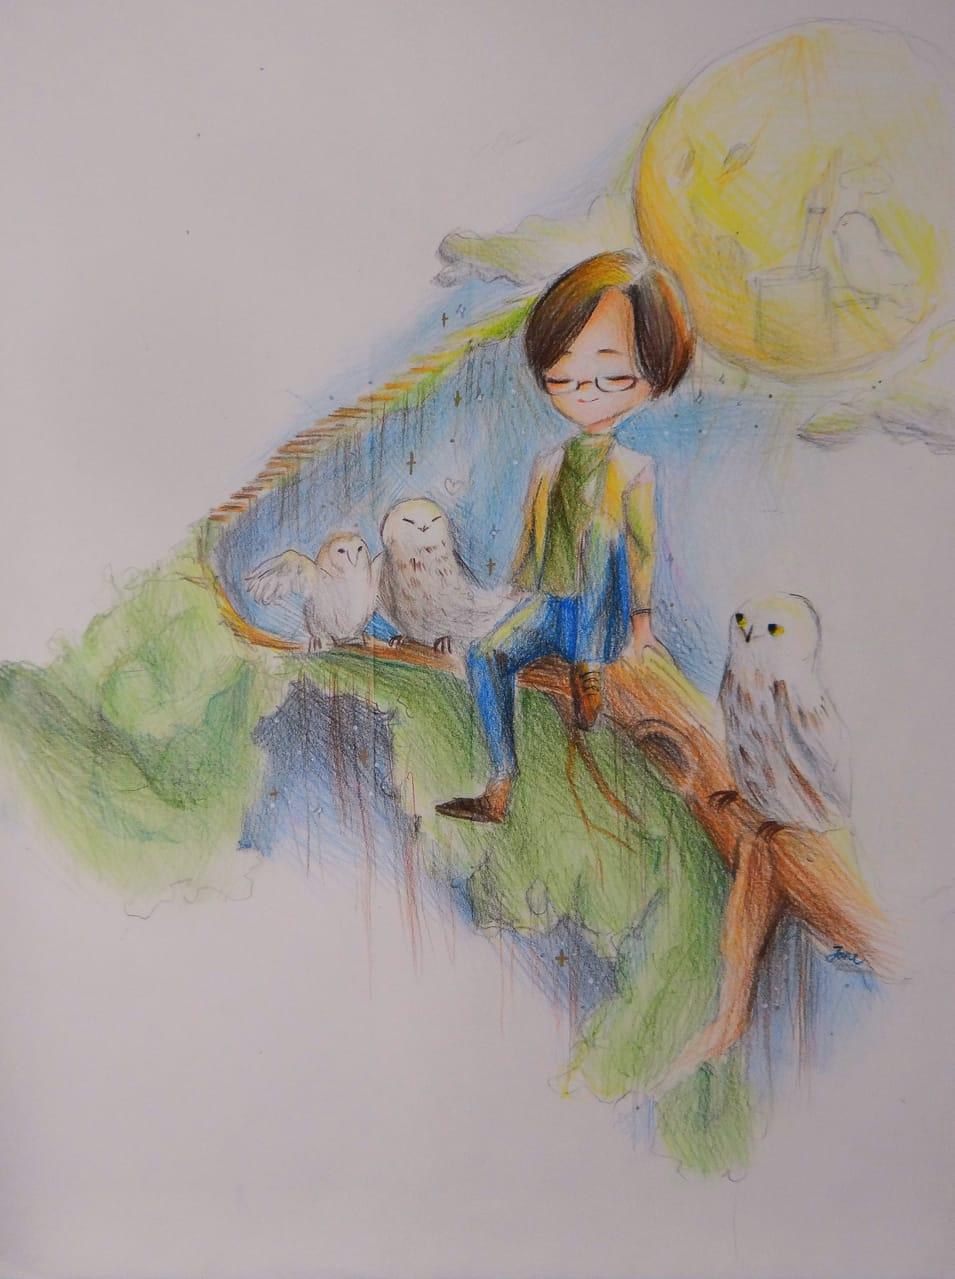 月見貓頭鷹 Illust of janejane 夜色 moon 月色 貓頭鷹